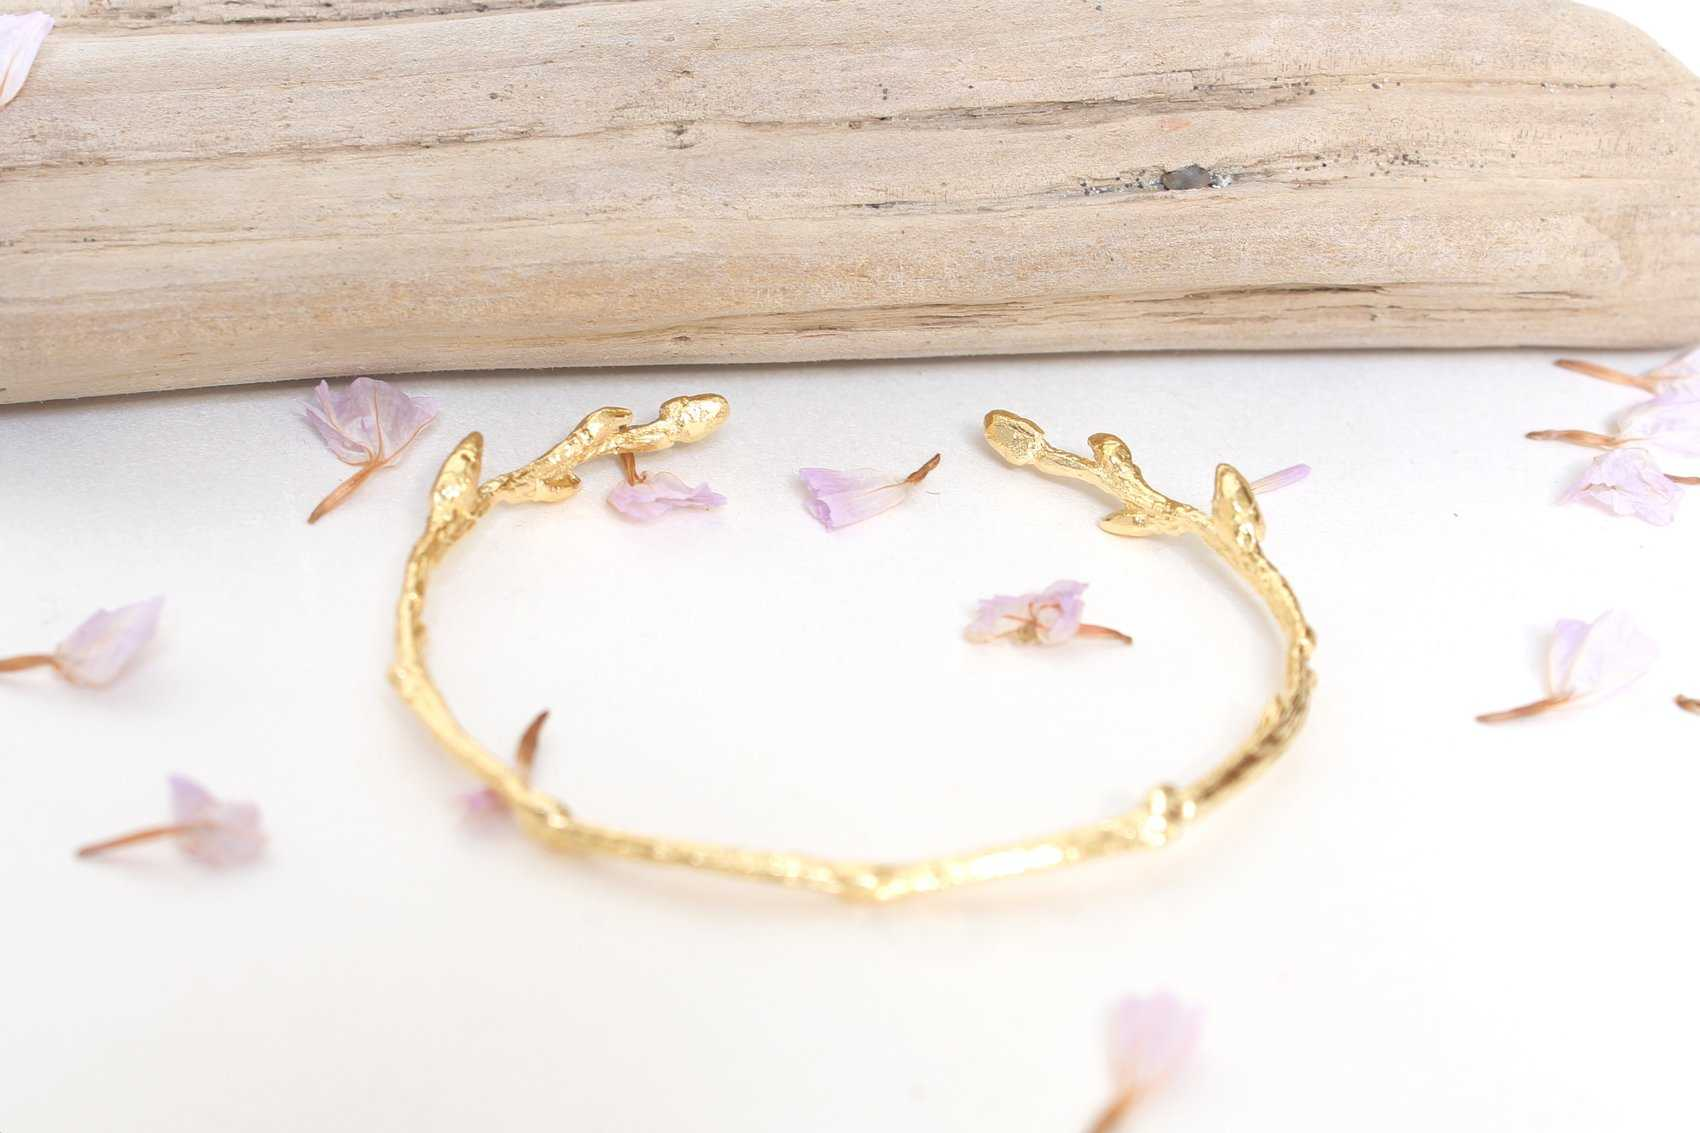 Primavera Pulsera/Bracelet